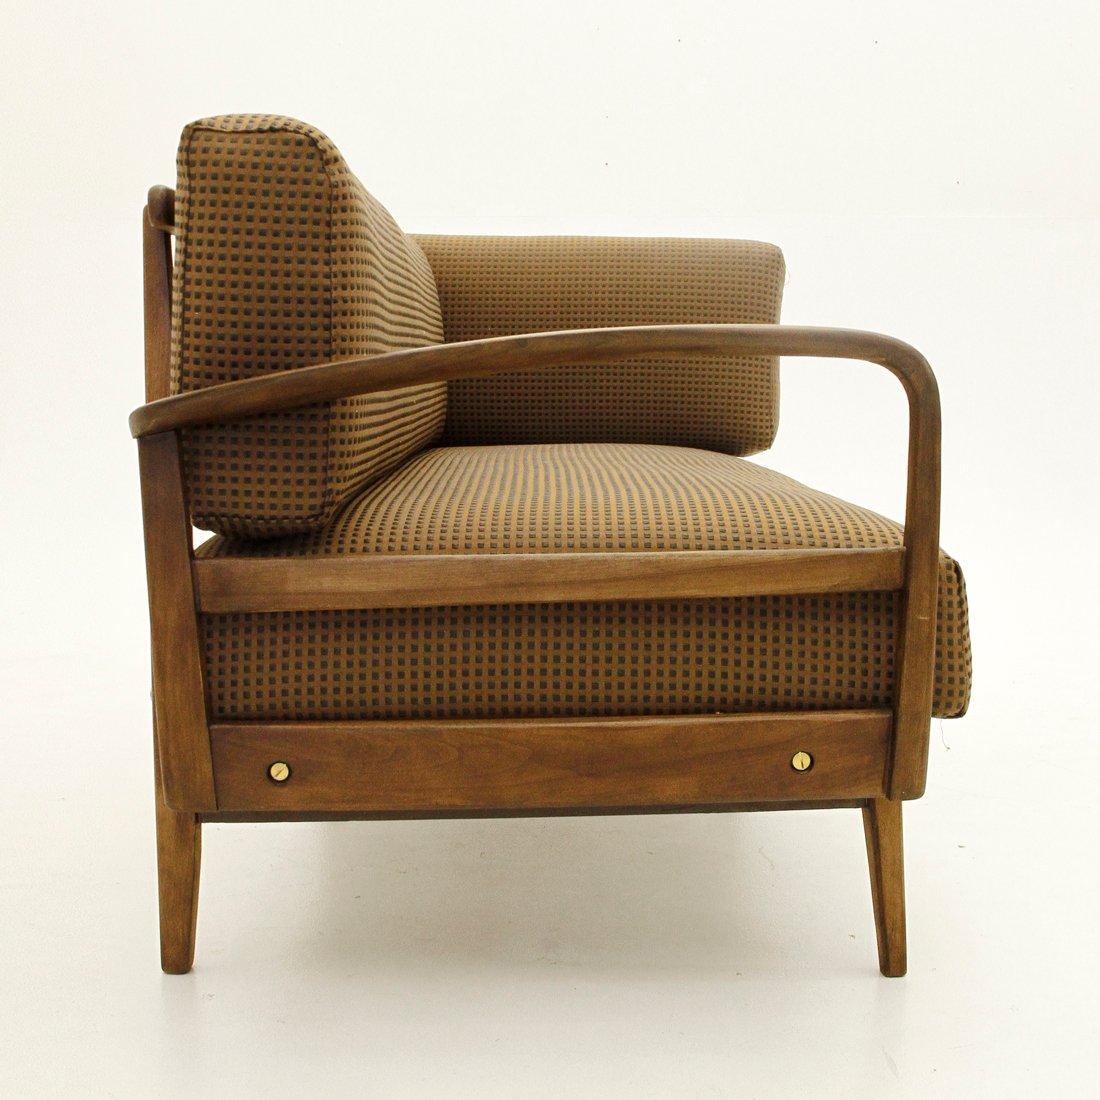 Italienisches Sofa Mit Holzgestell 1950er Bei Pamono Kaufen